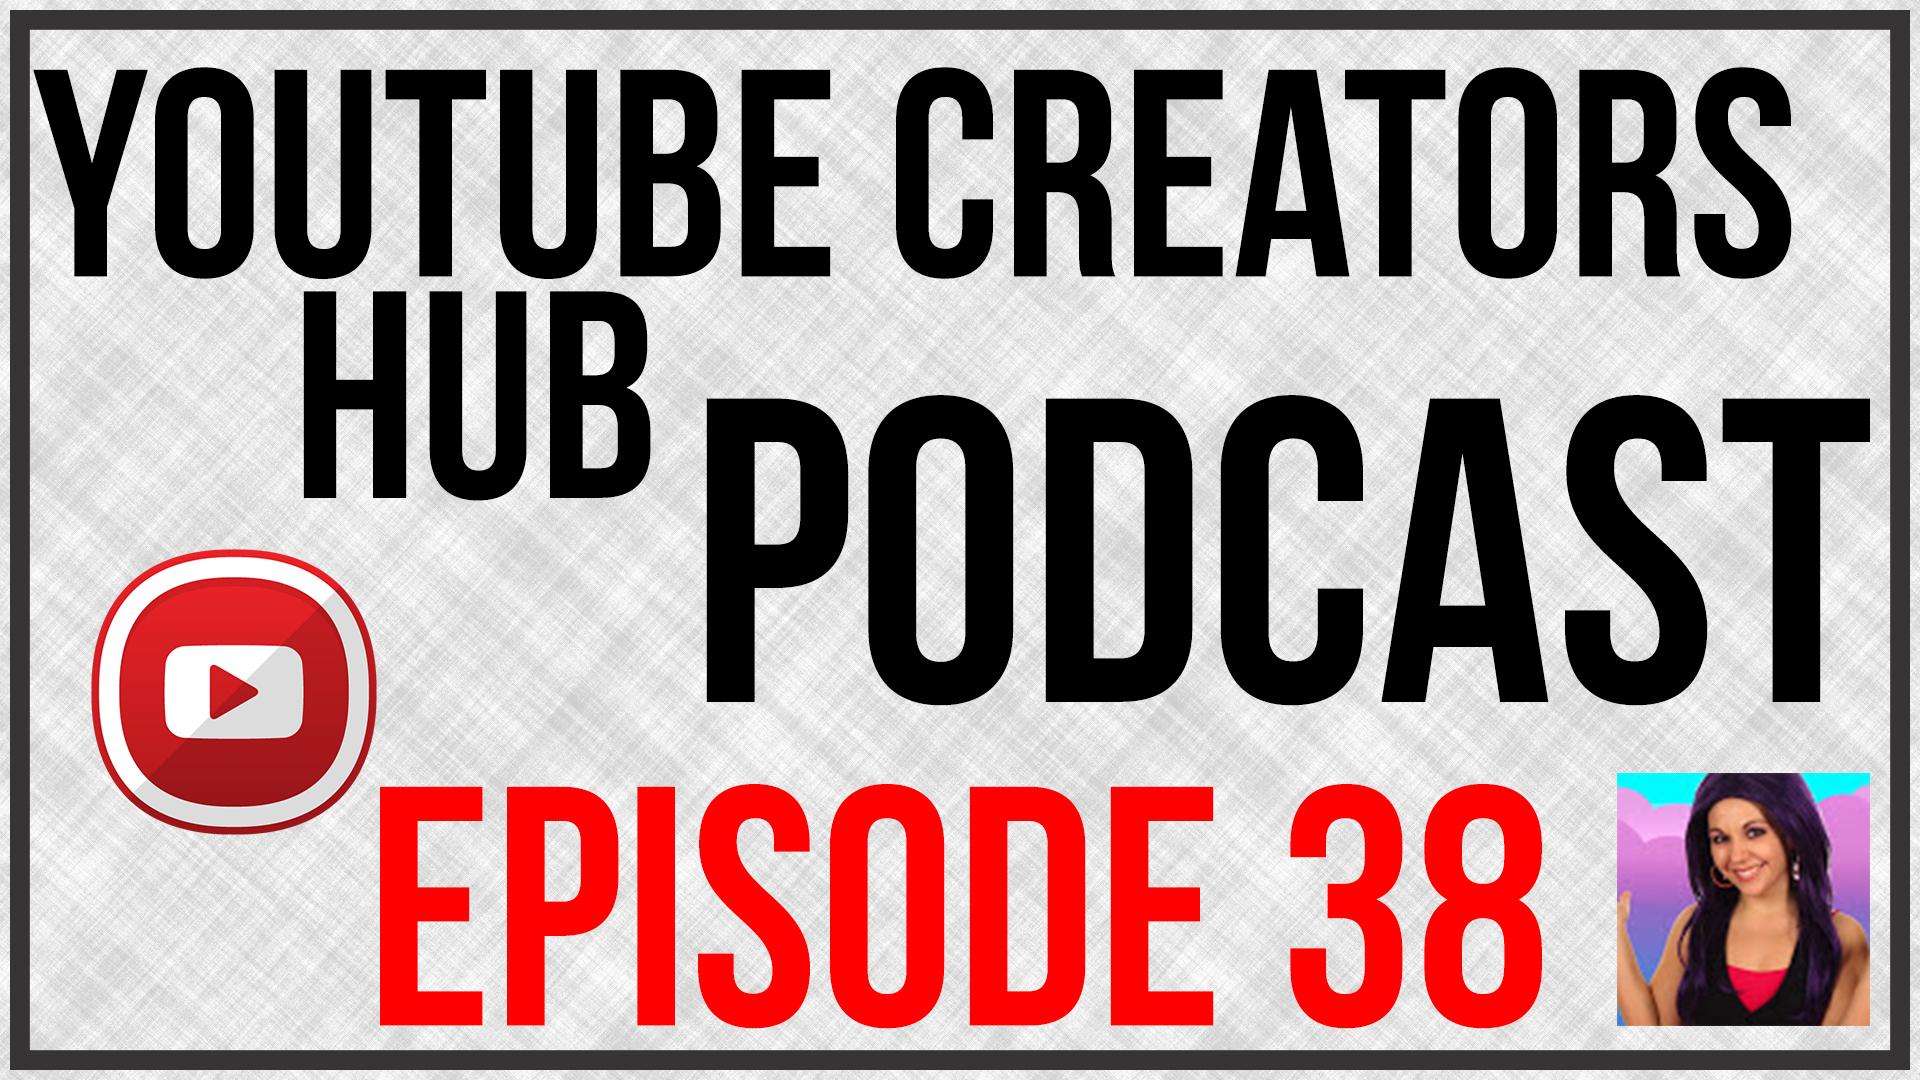 youtube creators hub podcast episode 38